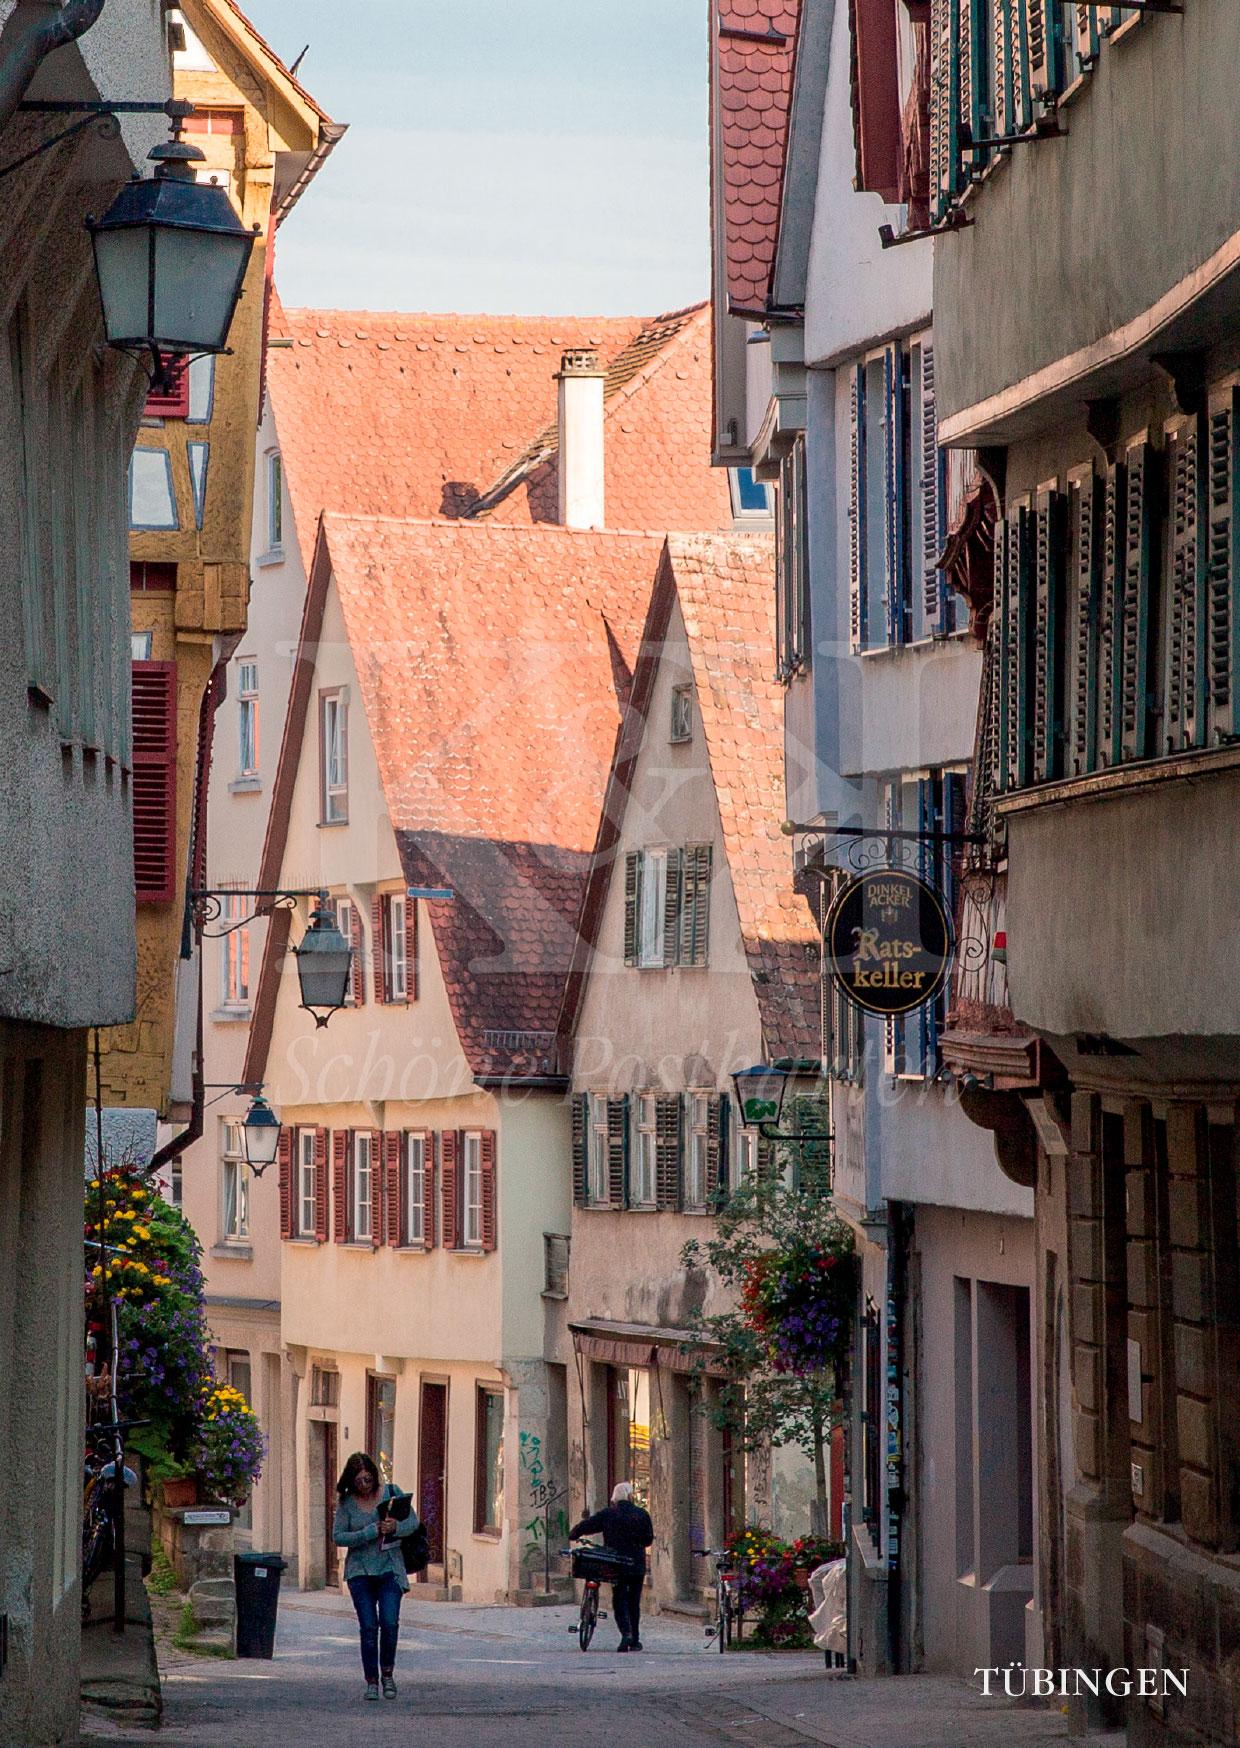 Schöne Postkarte Nr. 37 · Haaggasse in Tübingen · © www.schoenepostkarten.de